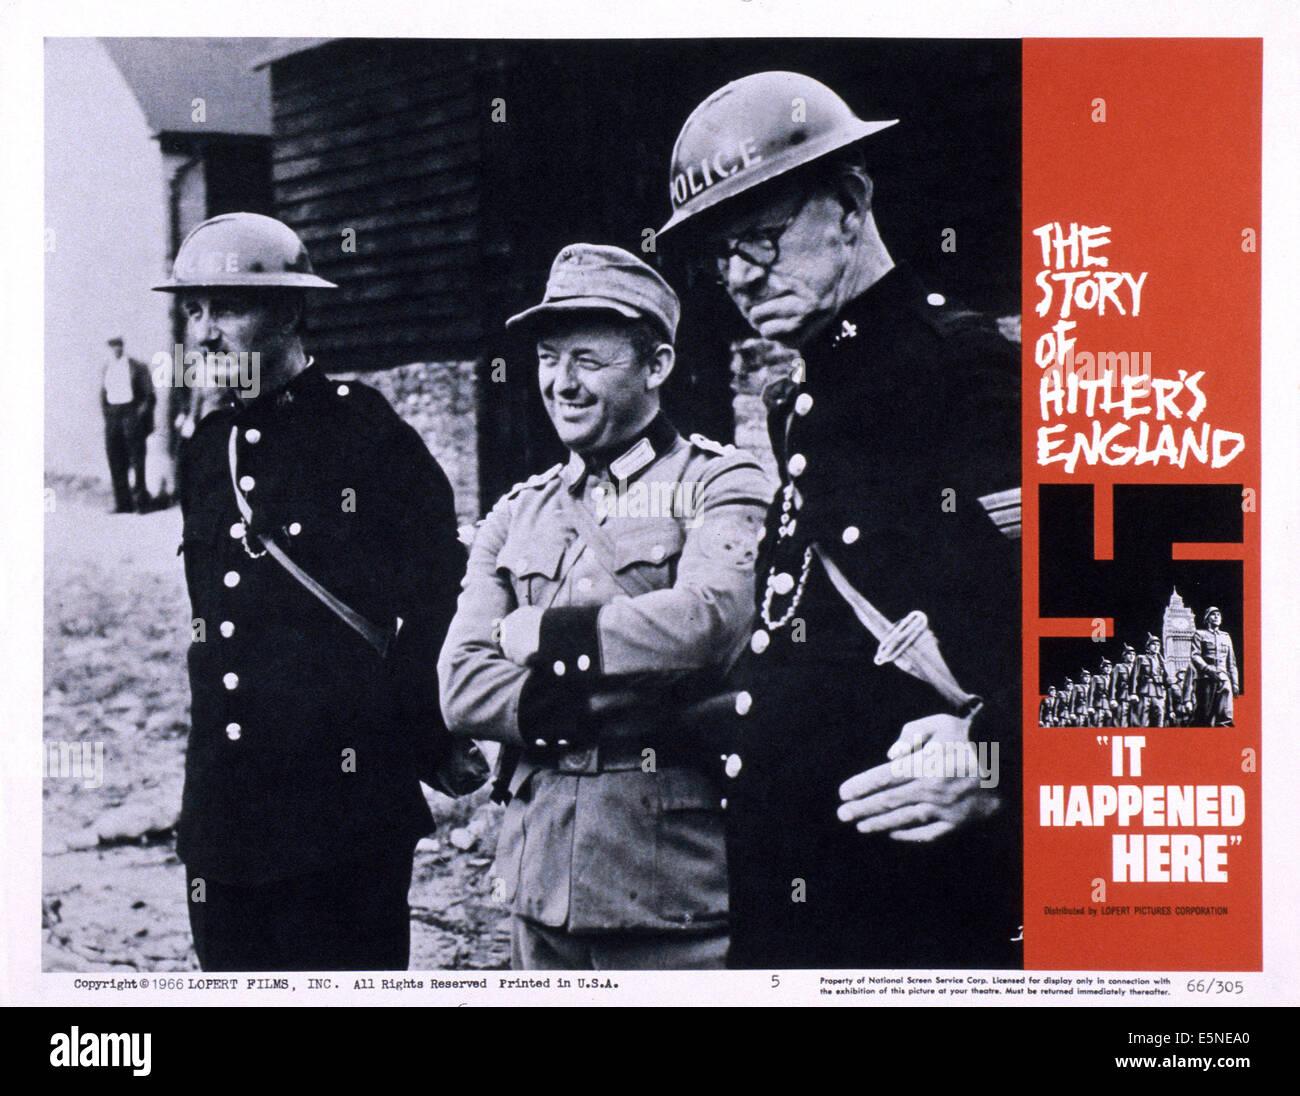 Aquí sucedió, 1965 Imagen De Stock